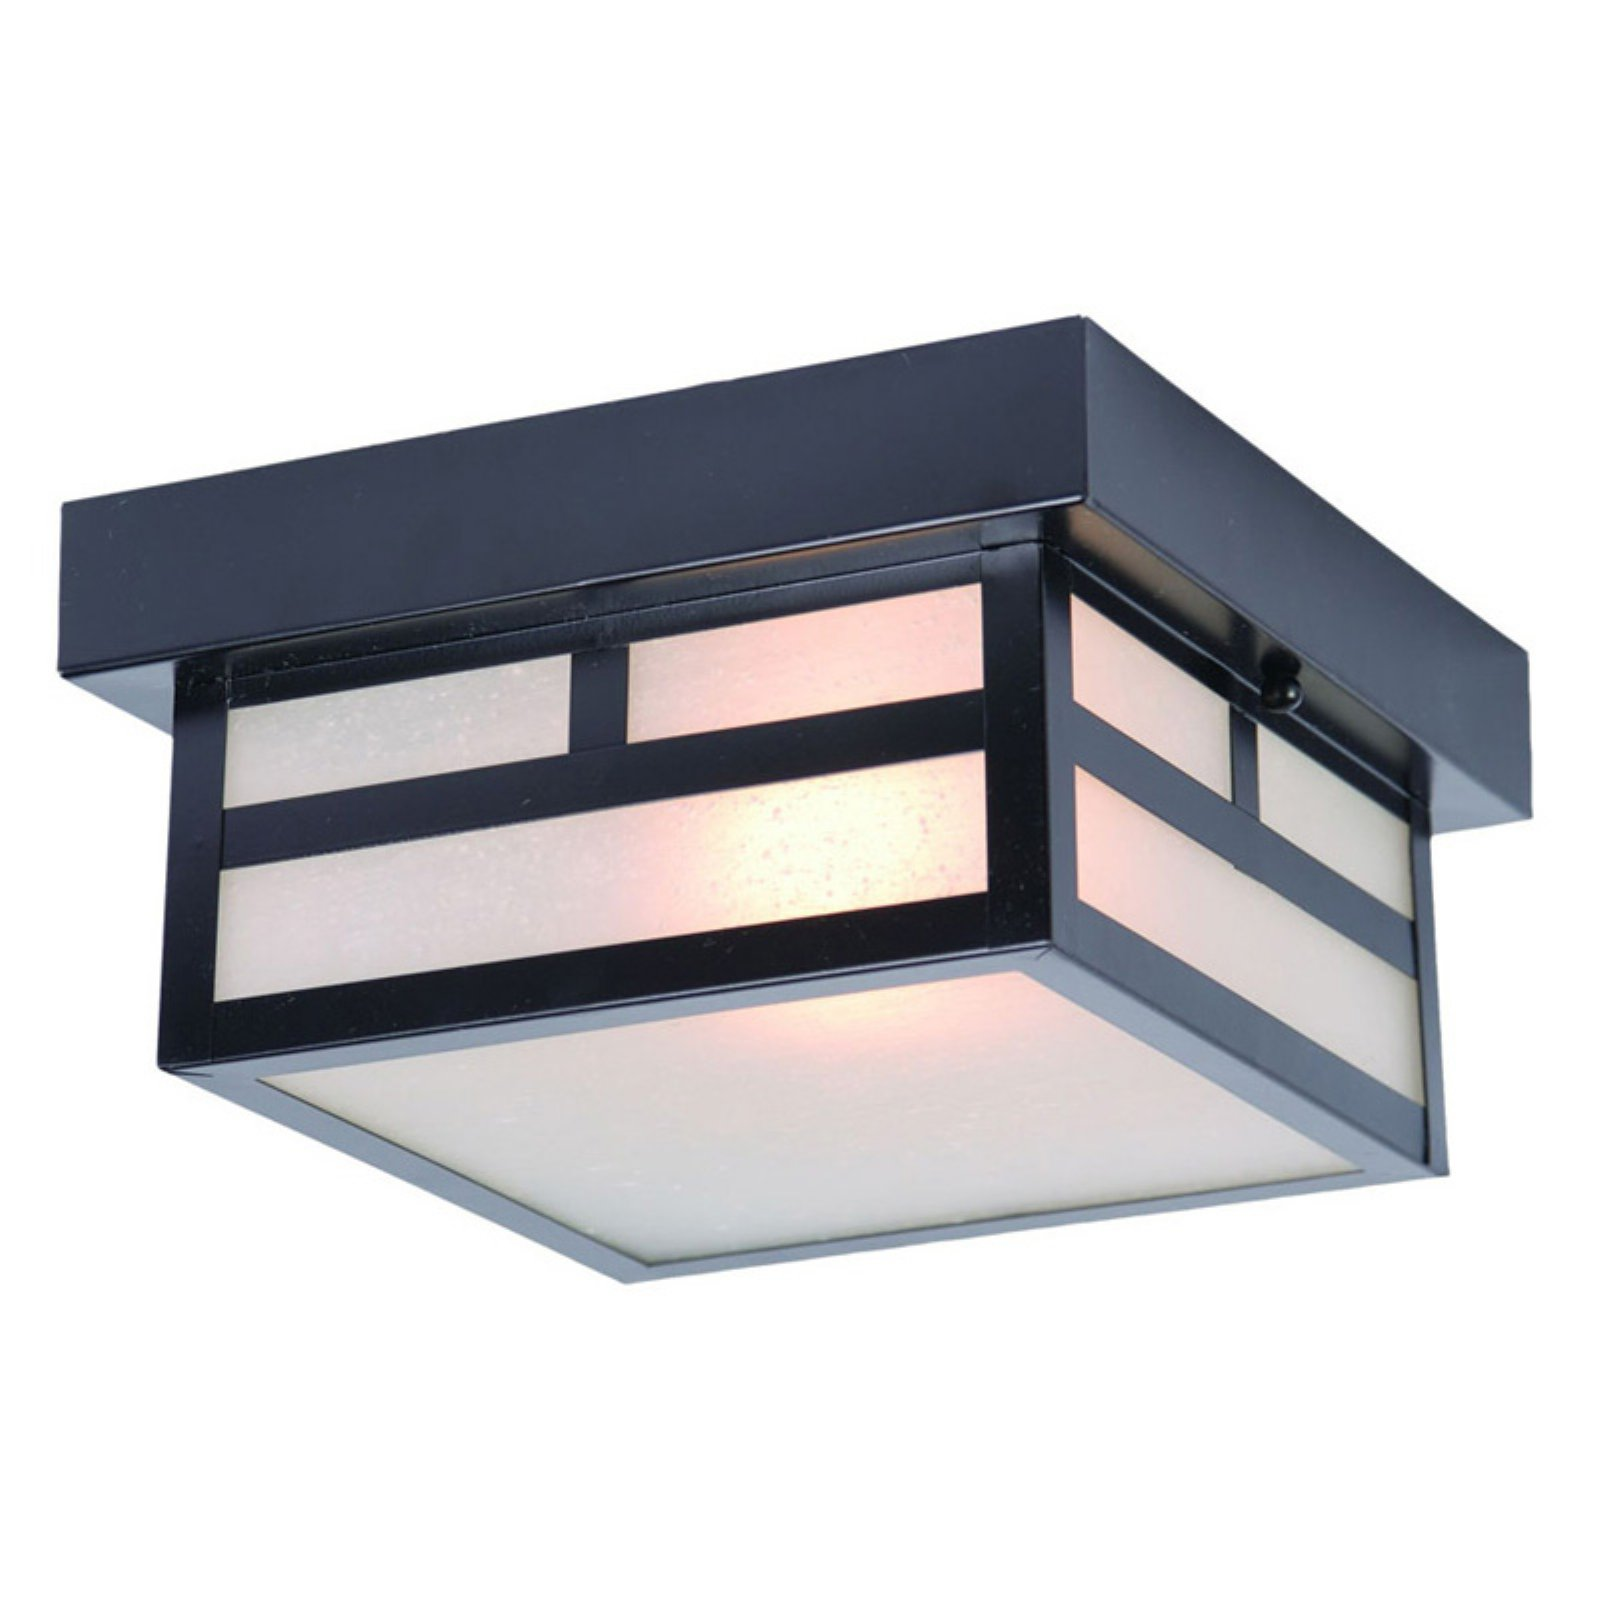 Acclaim Lighting Artisan 1 Light Outdoor Ceiling Mount Light Fixture